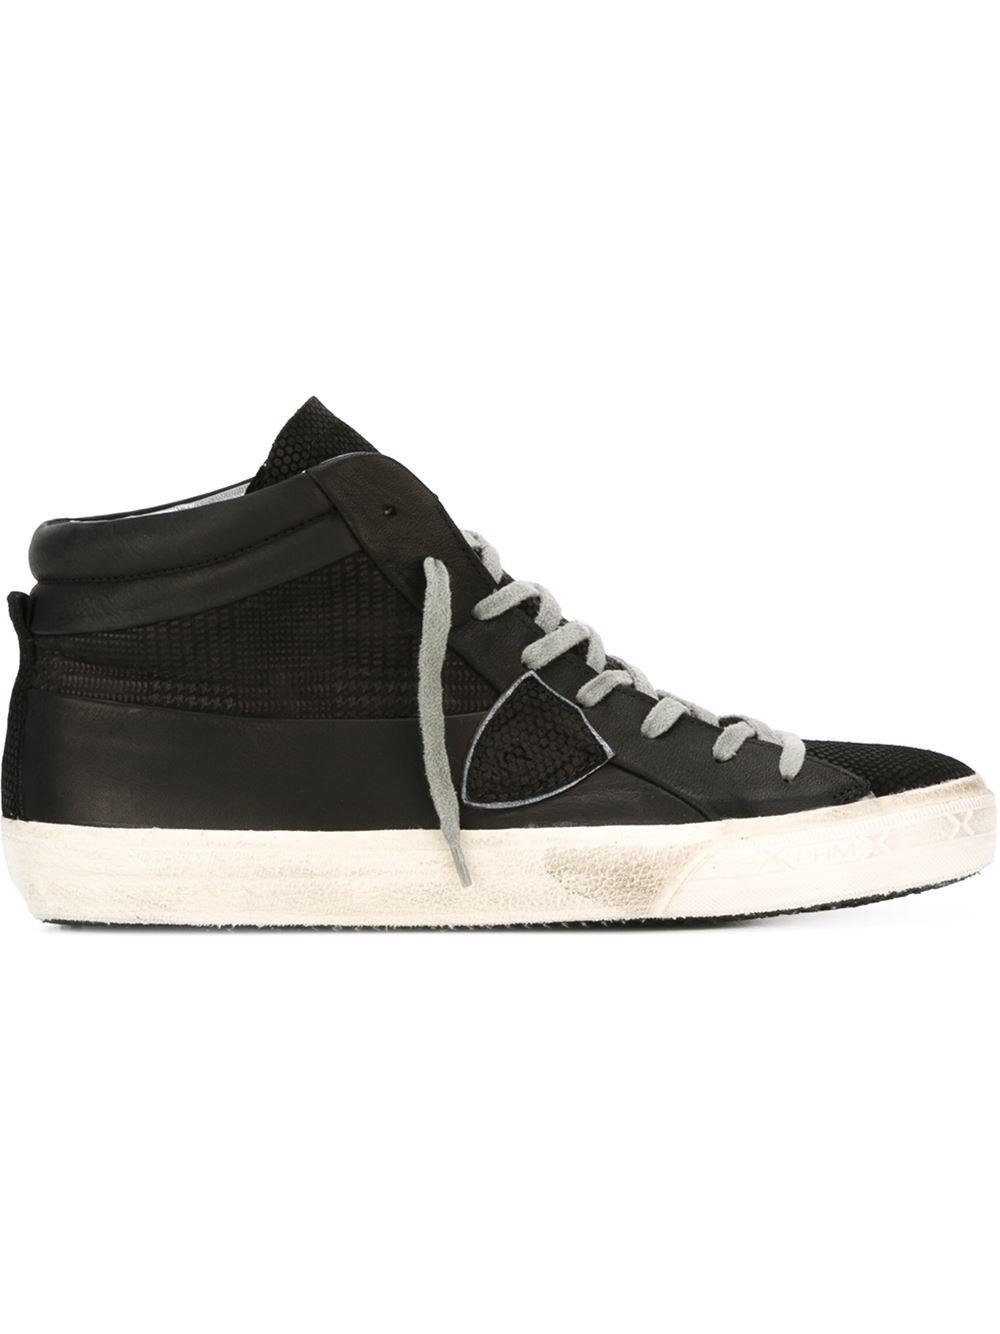 philippe model hi top sneakers in black for men lyst. Black Bedroom Furniture Sets. Home Design Ideas